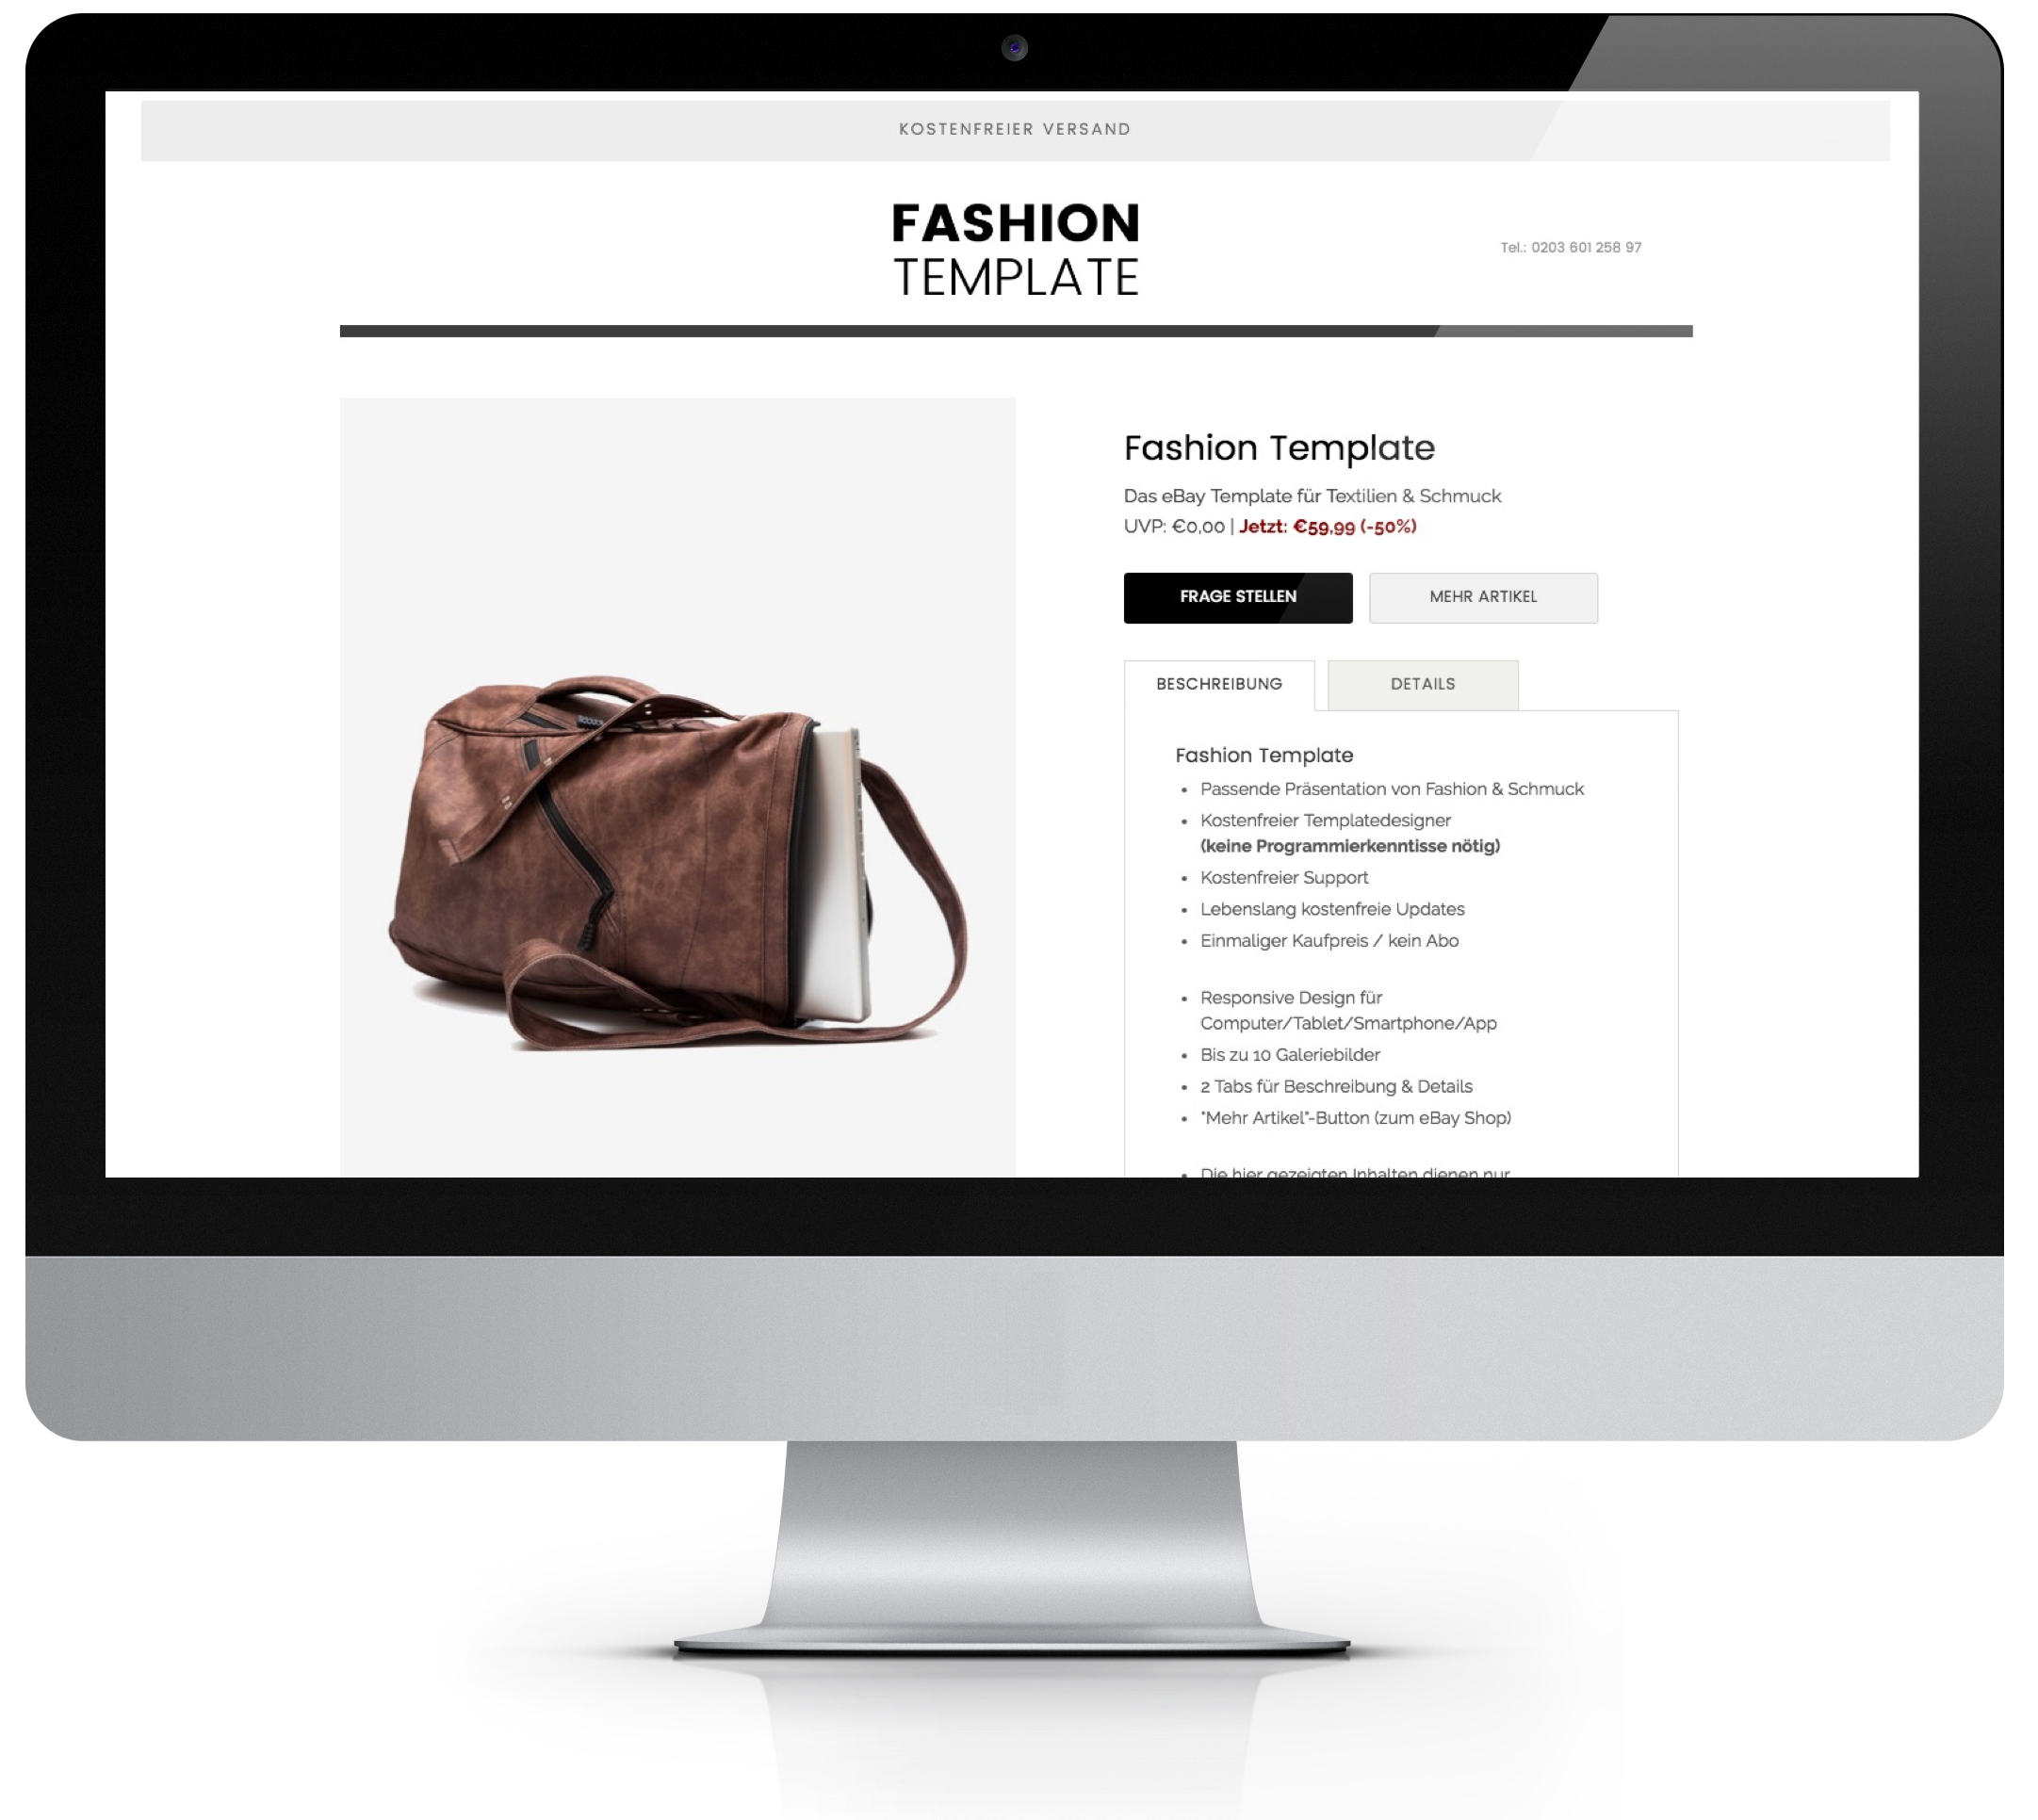 Fashion Template Angebotsvorlage Pixelsafari E Commerce Solutions